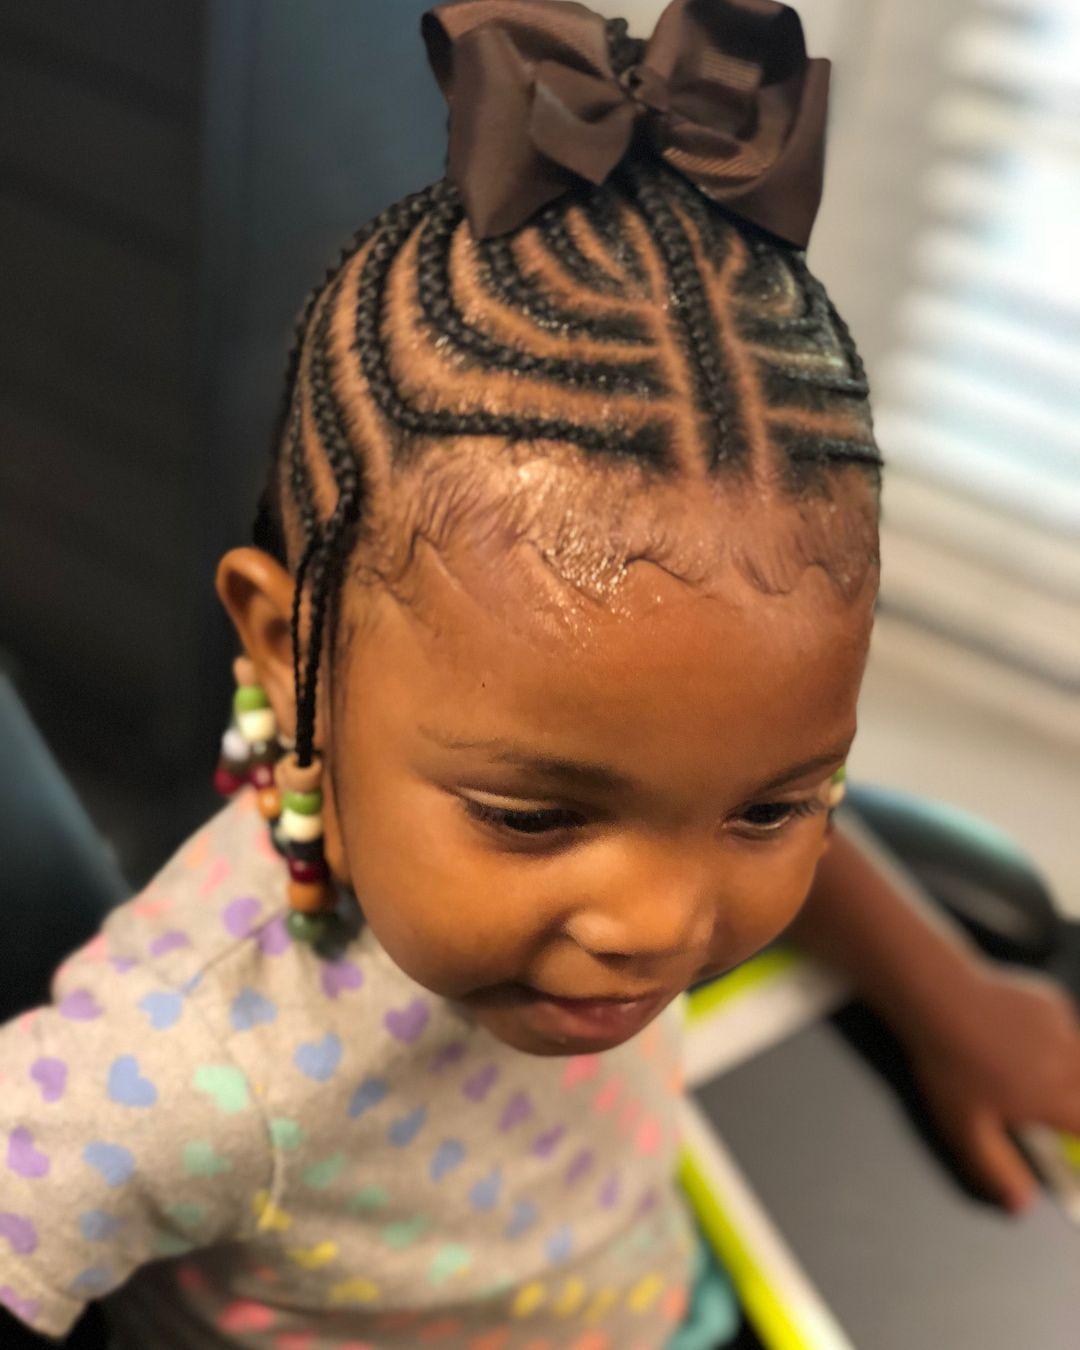 Hairstyle Ideas For Growing Out A Bob New Hairstyle Ideas 2019 Hairstyle Ideas Art Baddie Hairs In 2020 Kleines Madchen Zopfe Baby Mit Haaren Flechtfrisuren Kinder